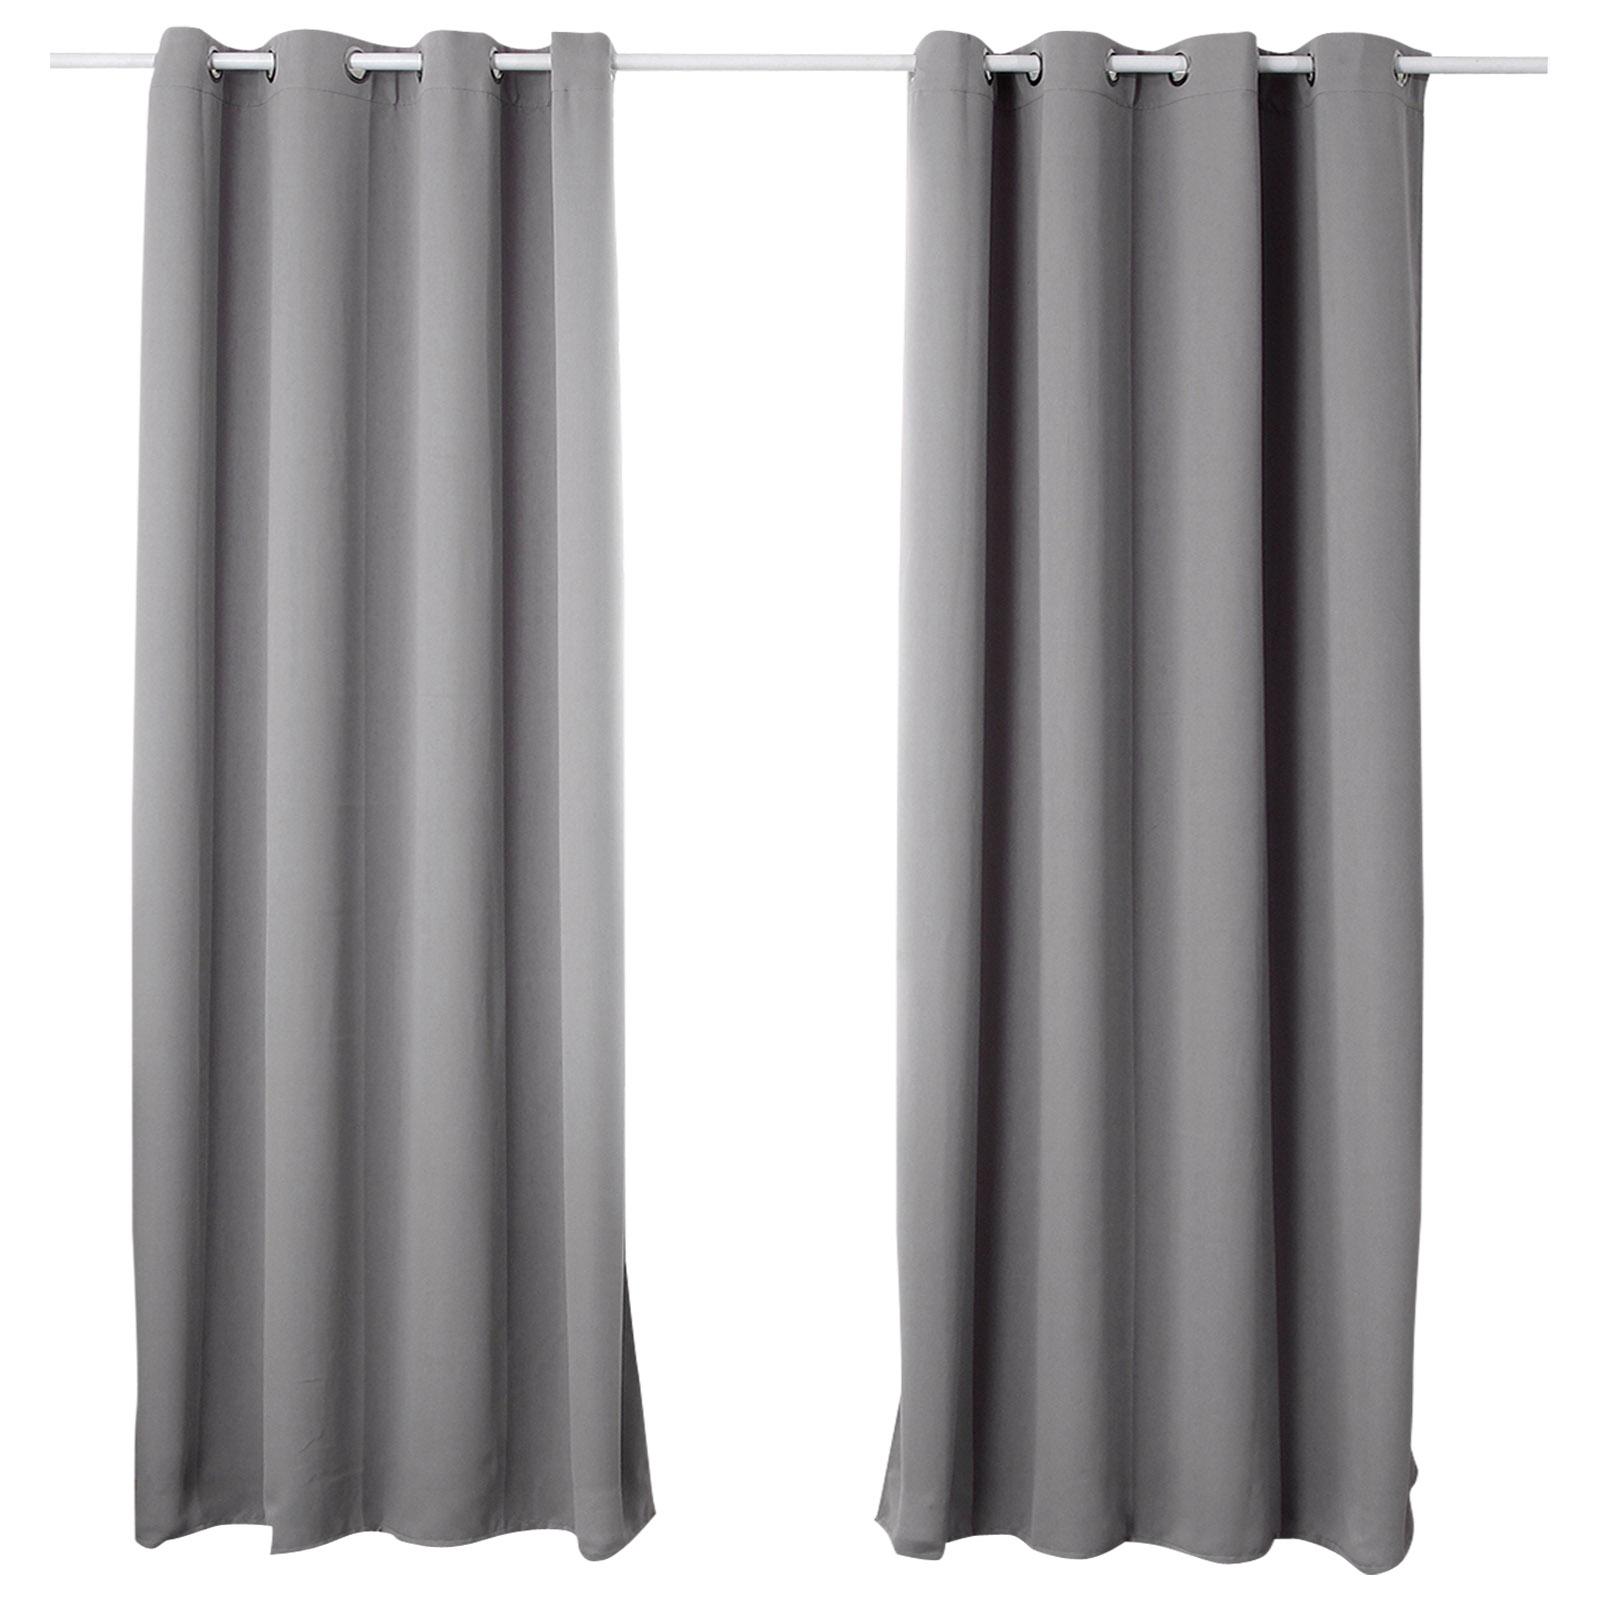 gardinen vorhang blickdicht mit sen thermo verdunkelung 250g m2 matt 329 a ebay. Black Bedroom Furniture Sets. Home Design Ideas